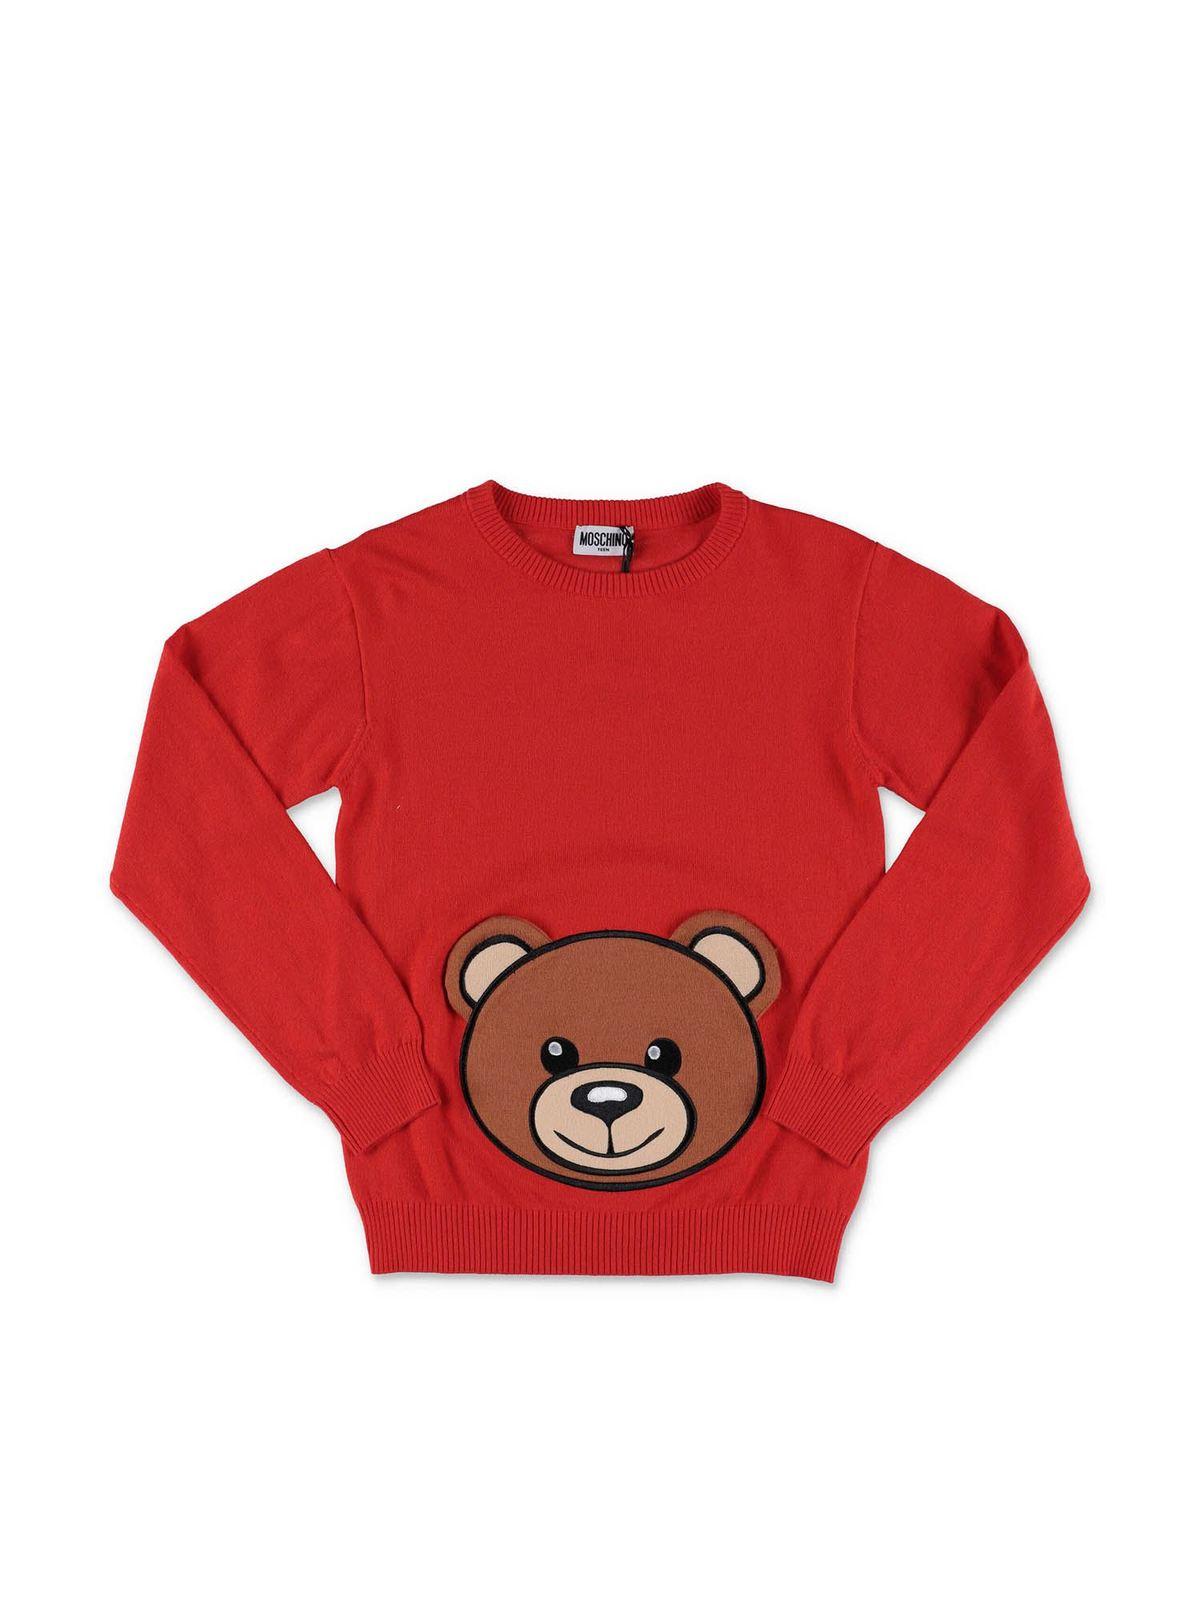 MOSCHINO RED TEDDY BEAR SWEATER